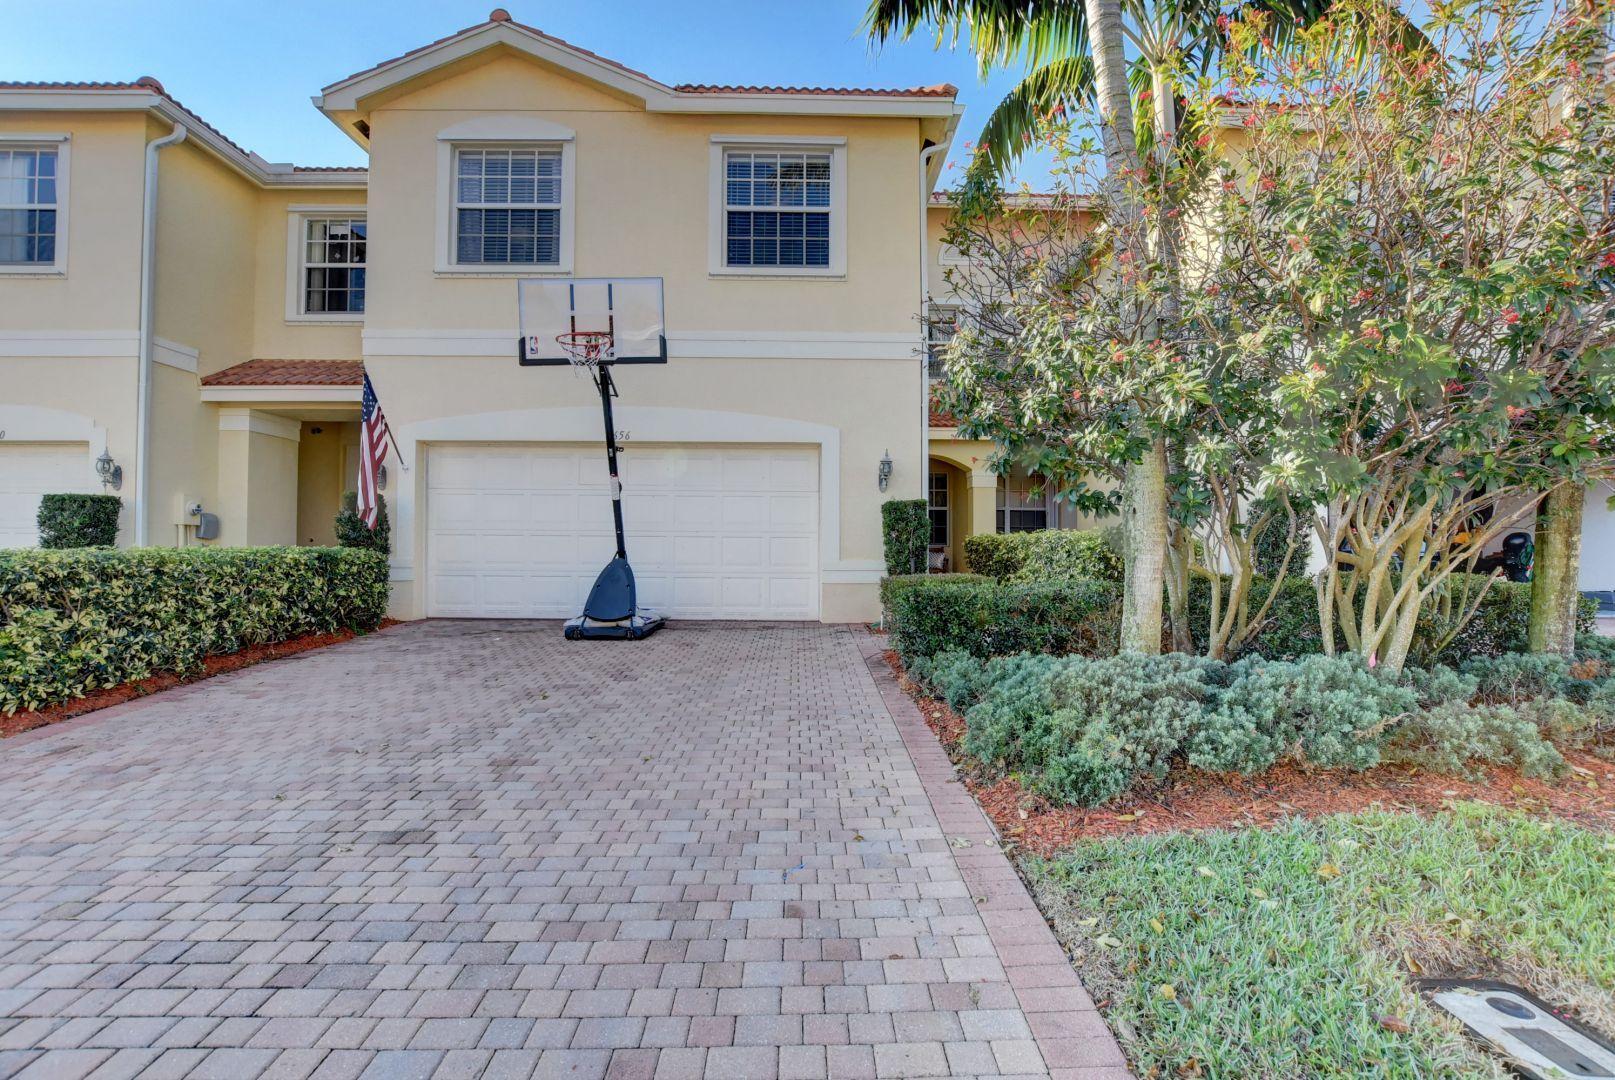 7656 Spatterdock Drive, Boynton Beach, Florida 33437, 4 Bedrooms Bedrooms, ,2.1 BathroomsBathrooms,Townhouse,For Sale,GREYSTONE,Spatterdock,RX-10502335